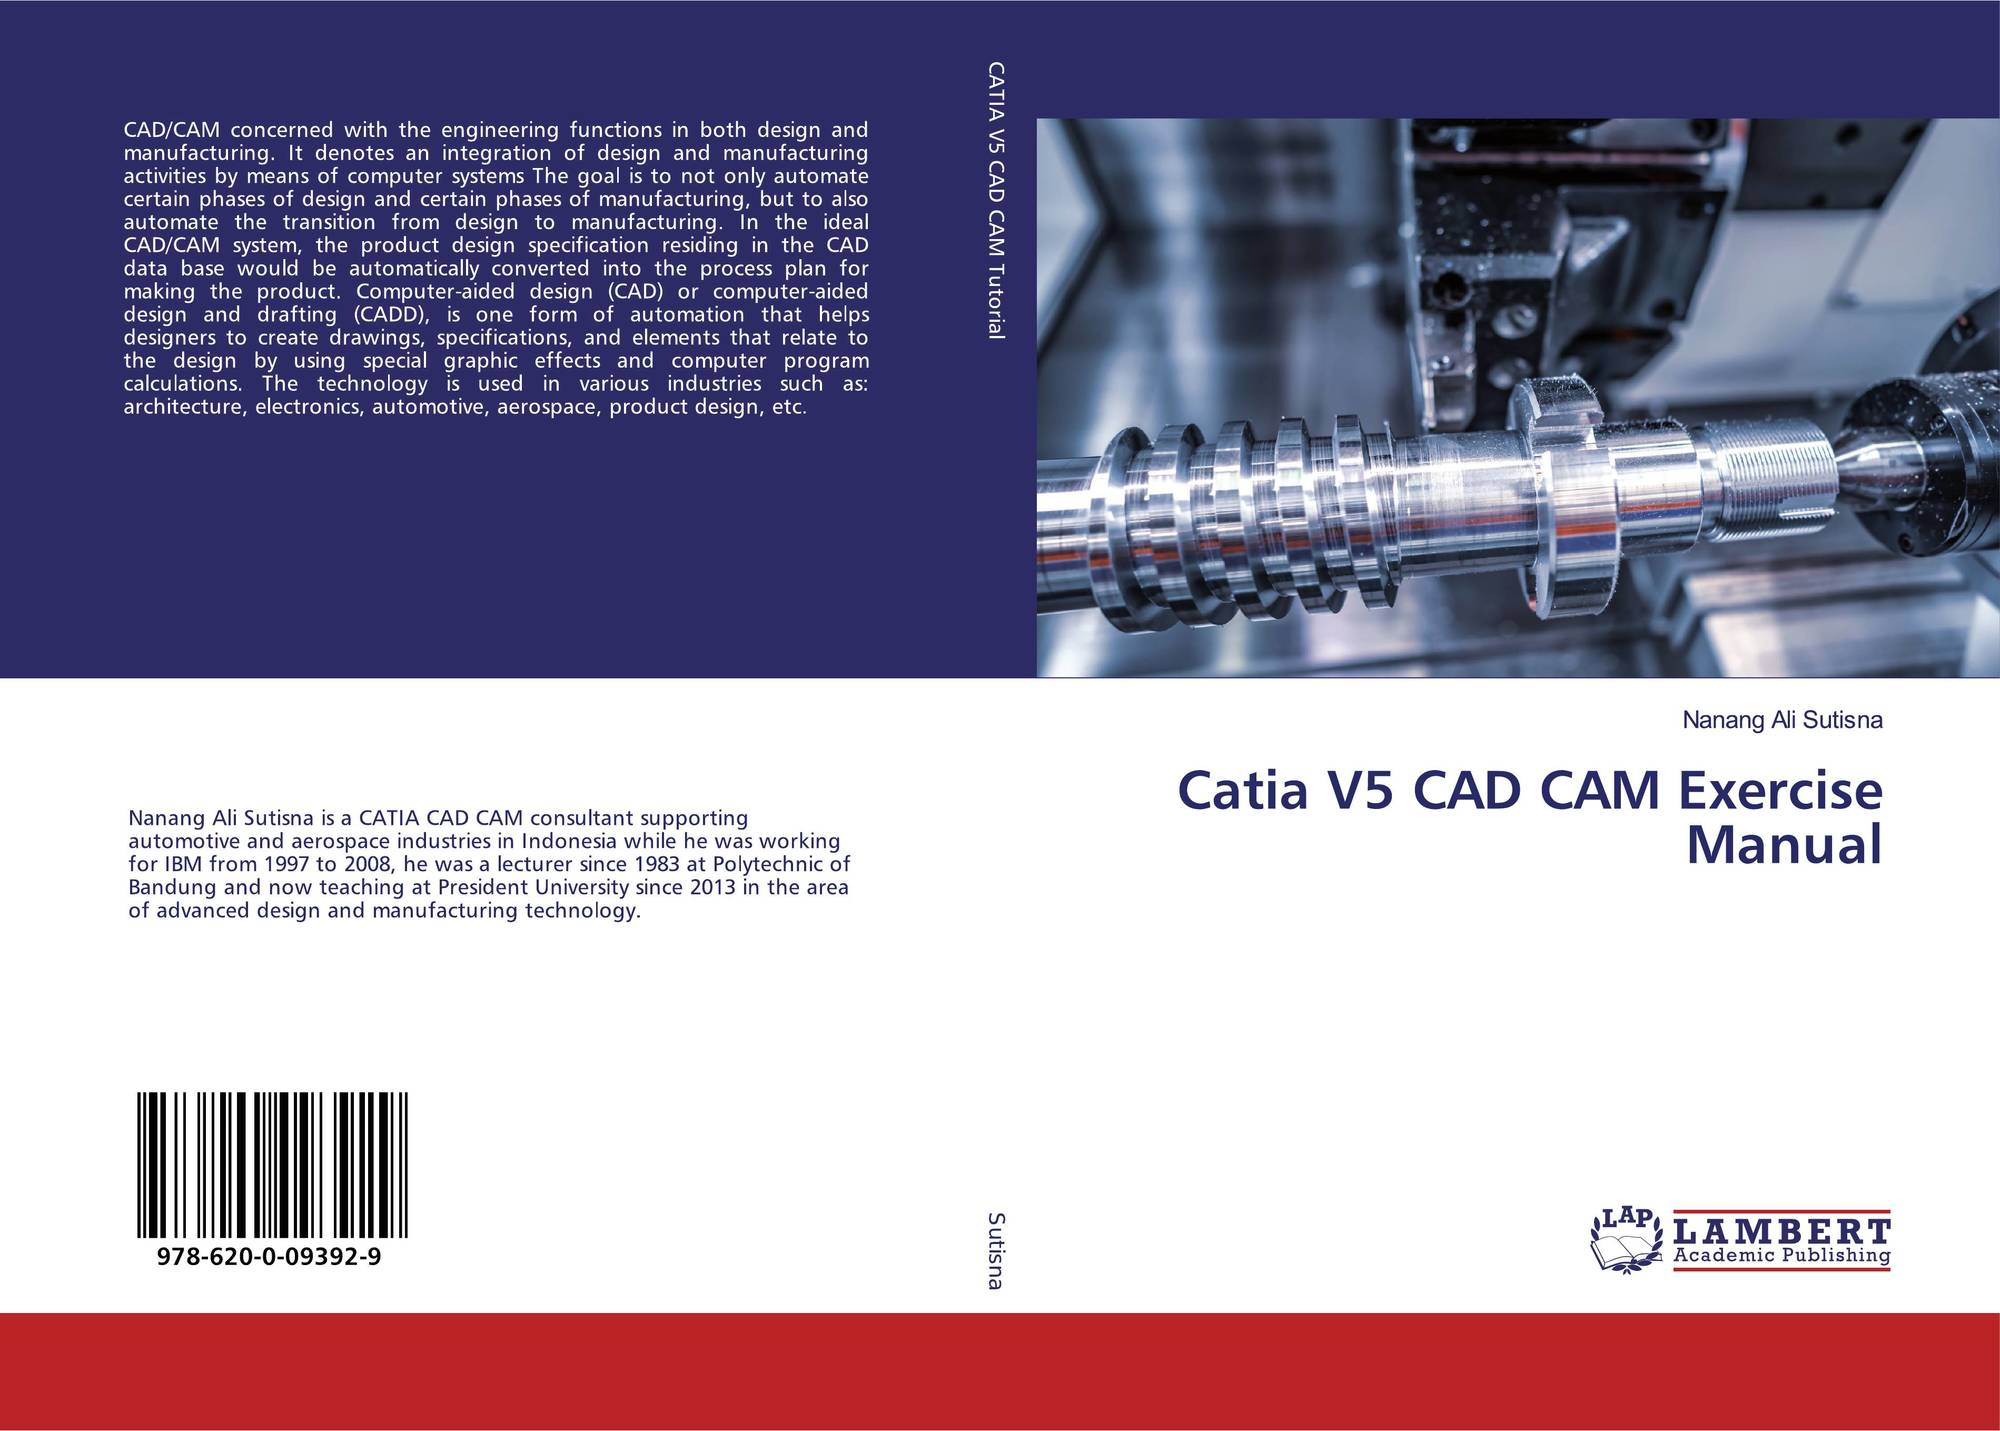 Catia V5 CAD CAM Exercise Manual, 978-620-0-09392-9